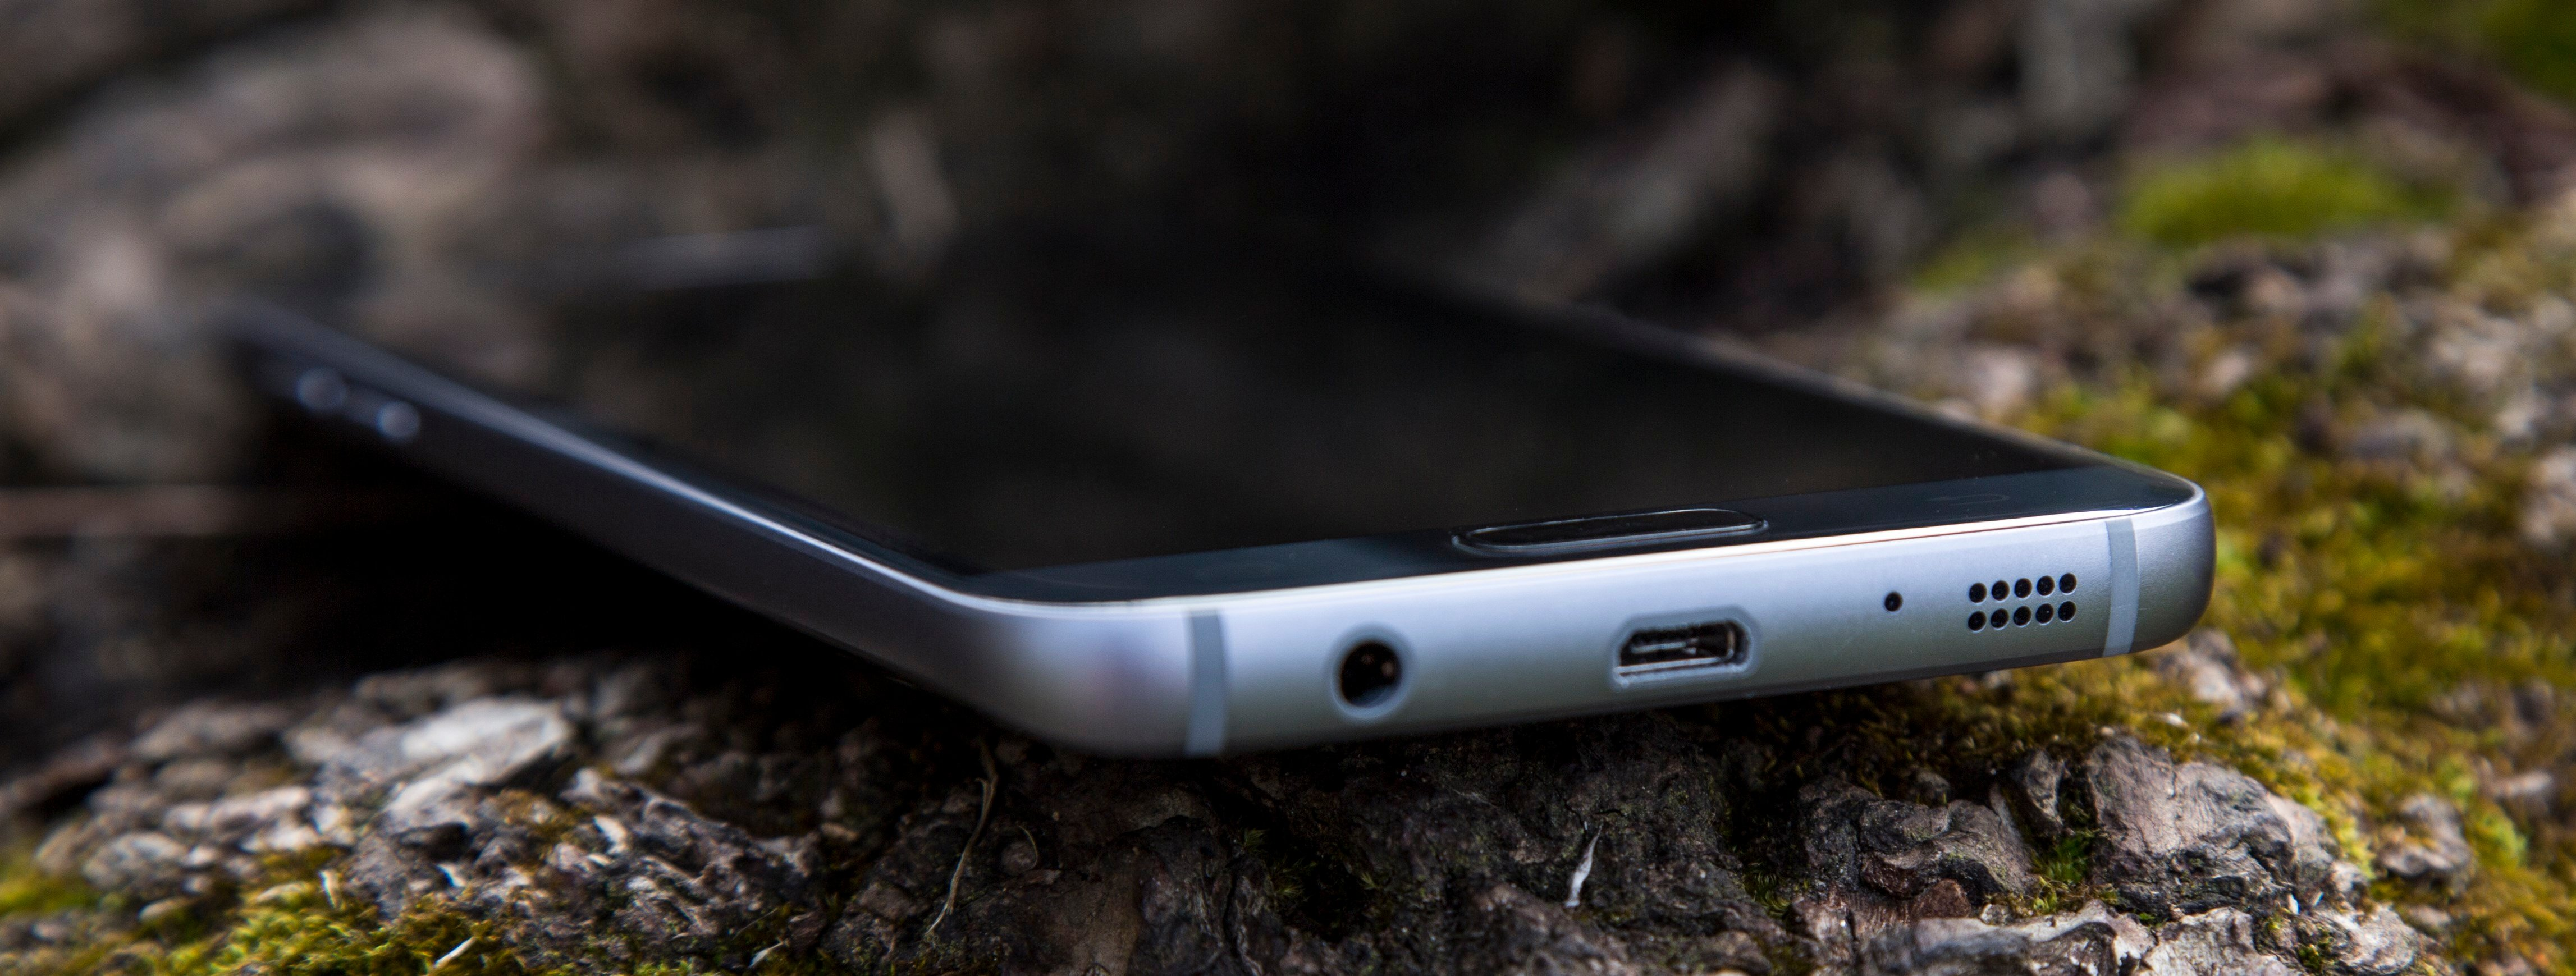 Samsung Galaxy S7 review: Still a great phone | Expert Reviews